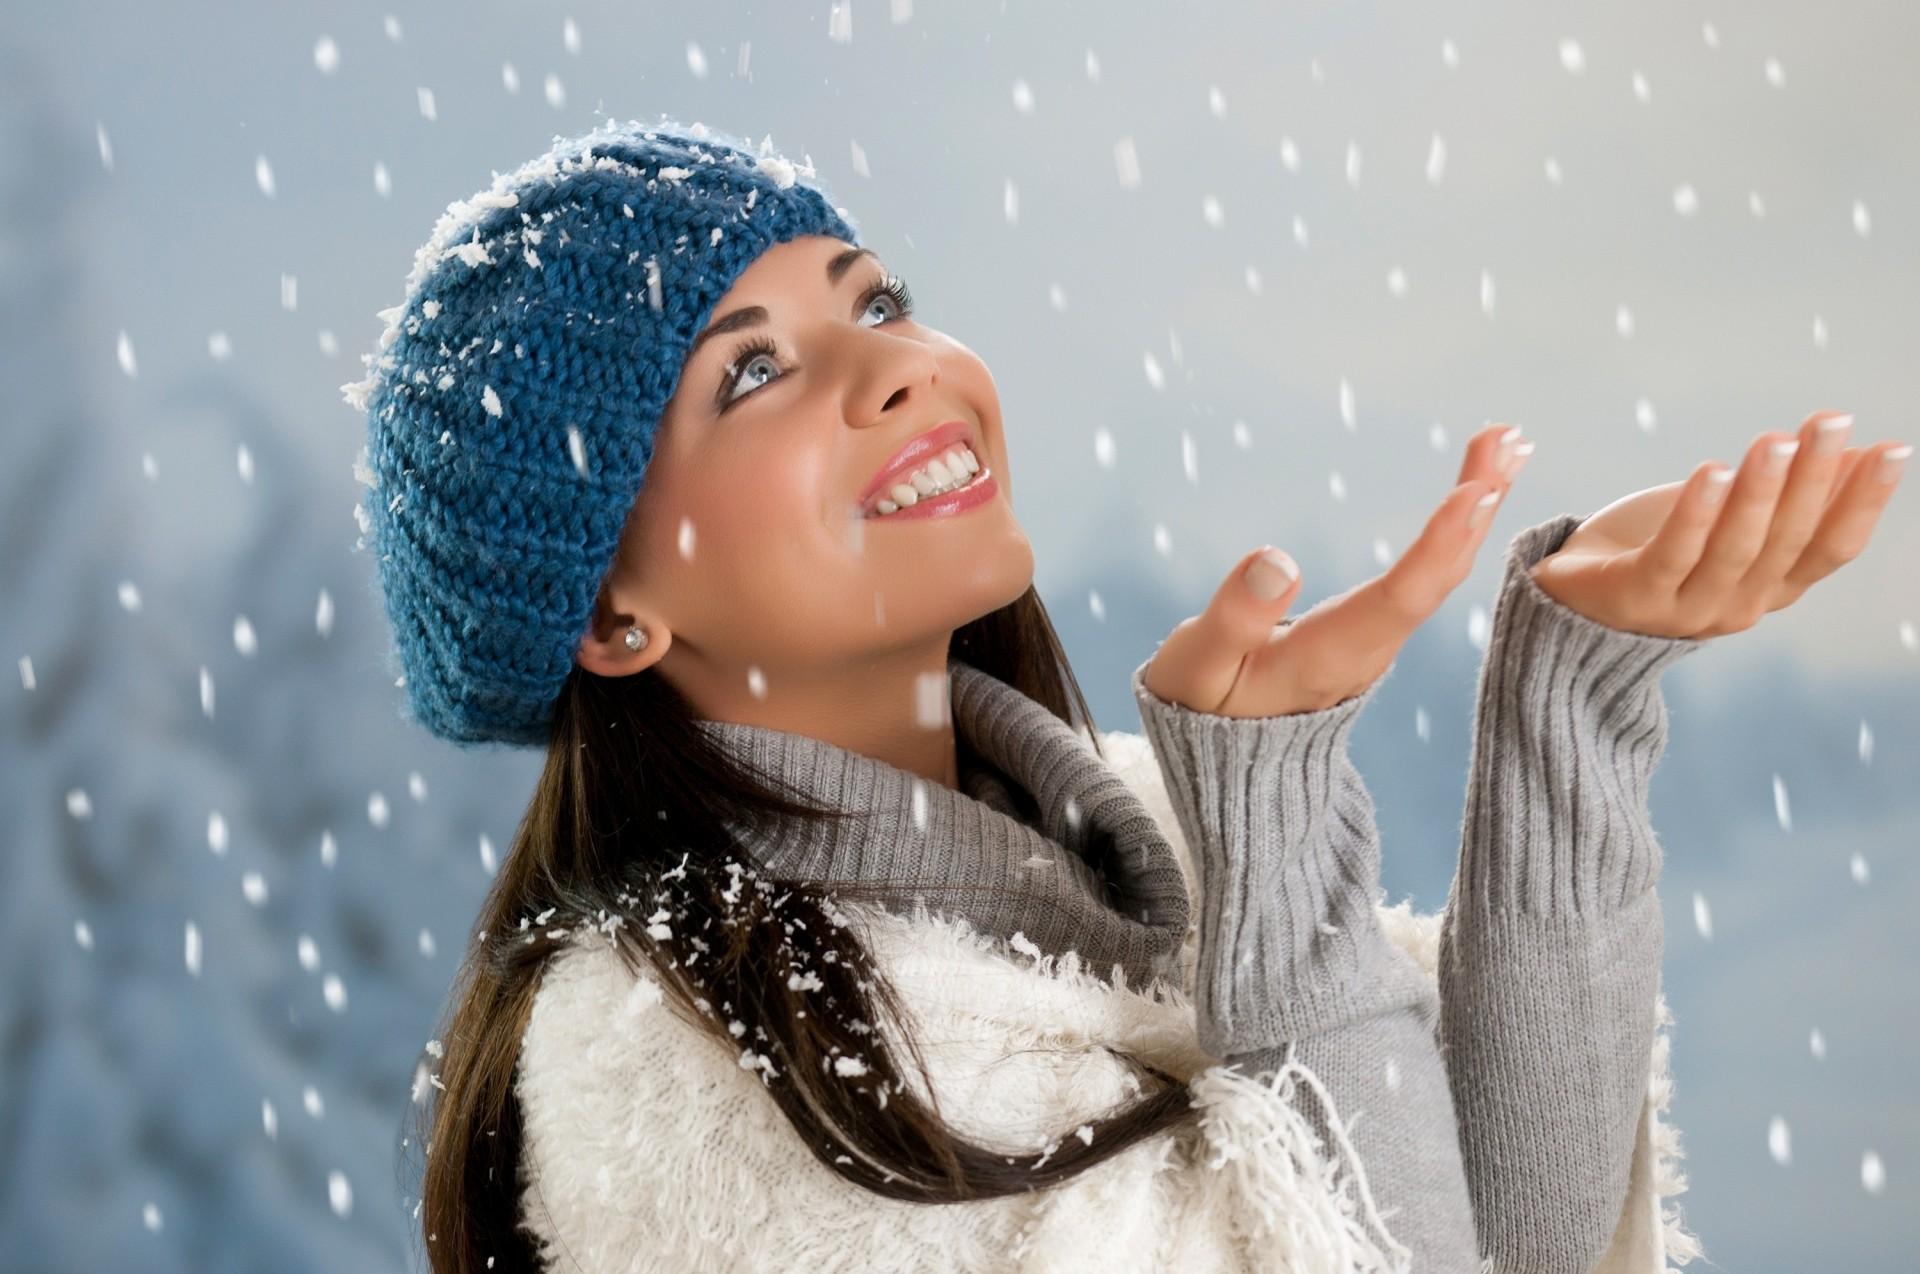 Падает снег на лицо картинки